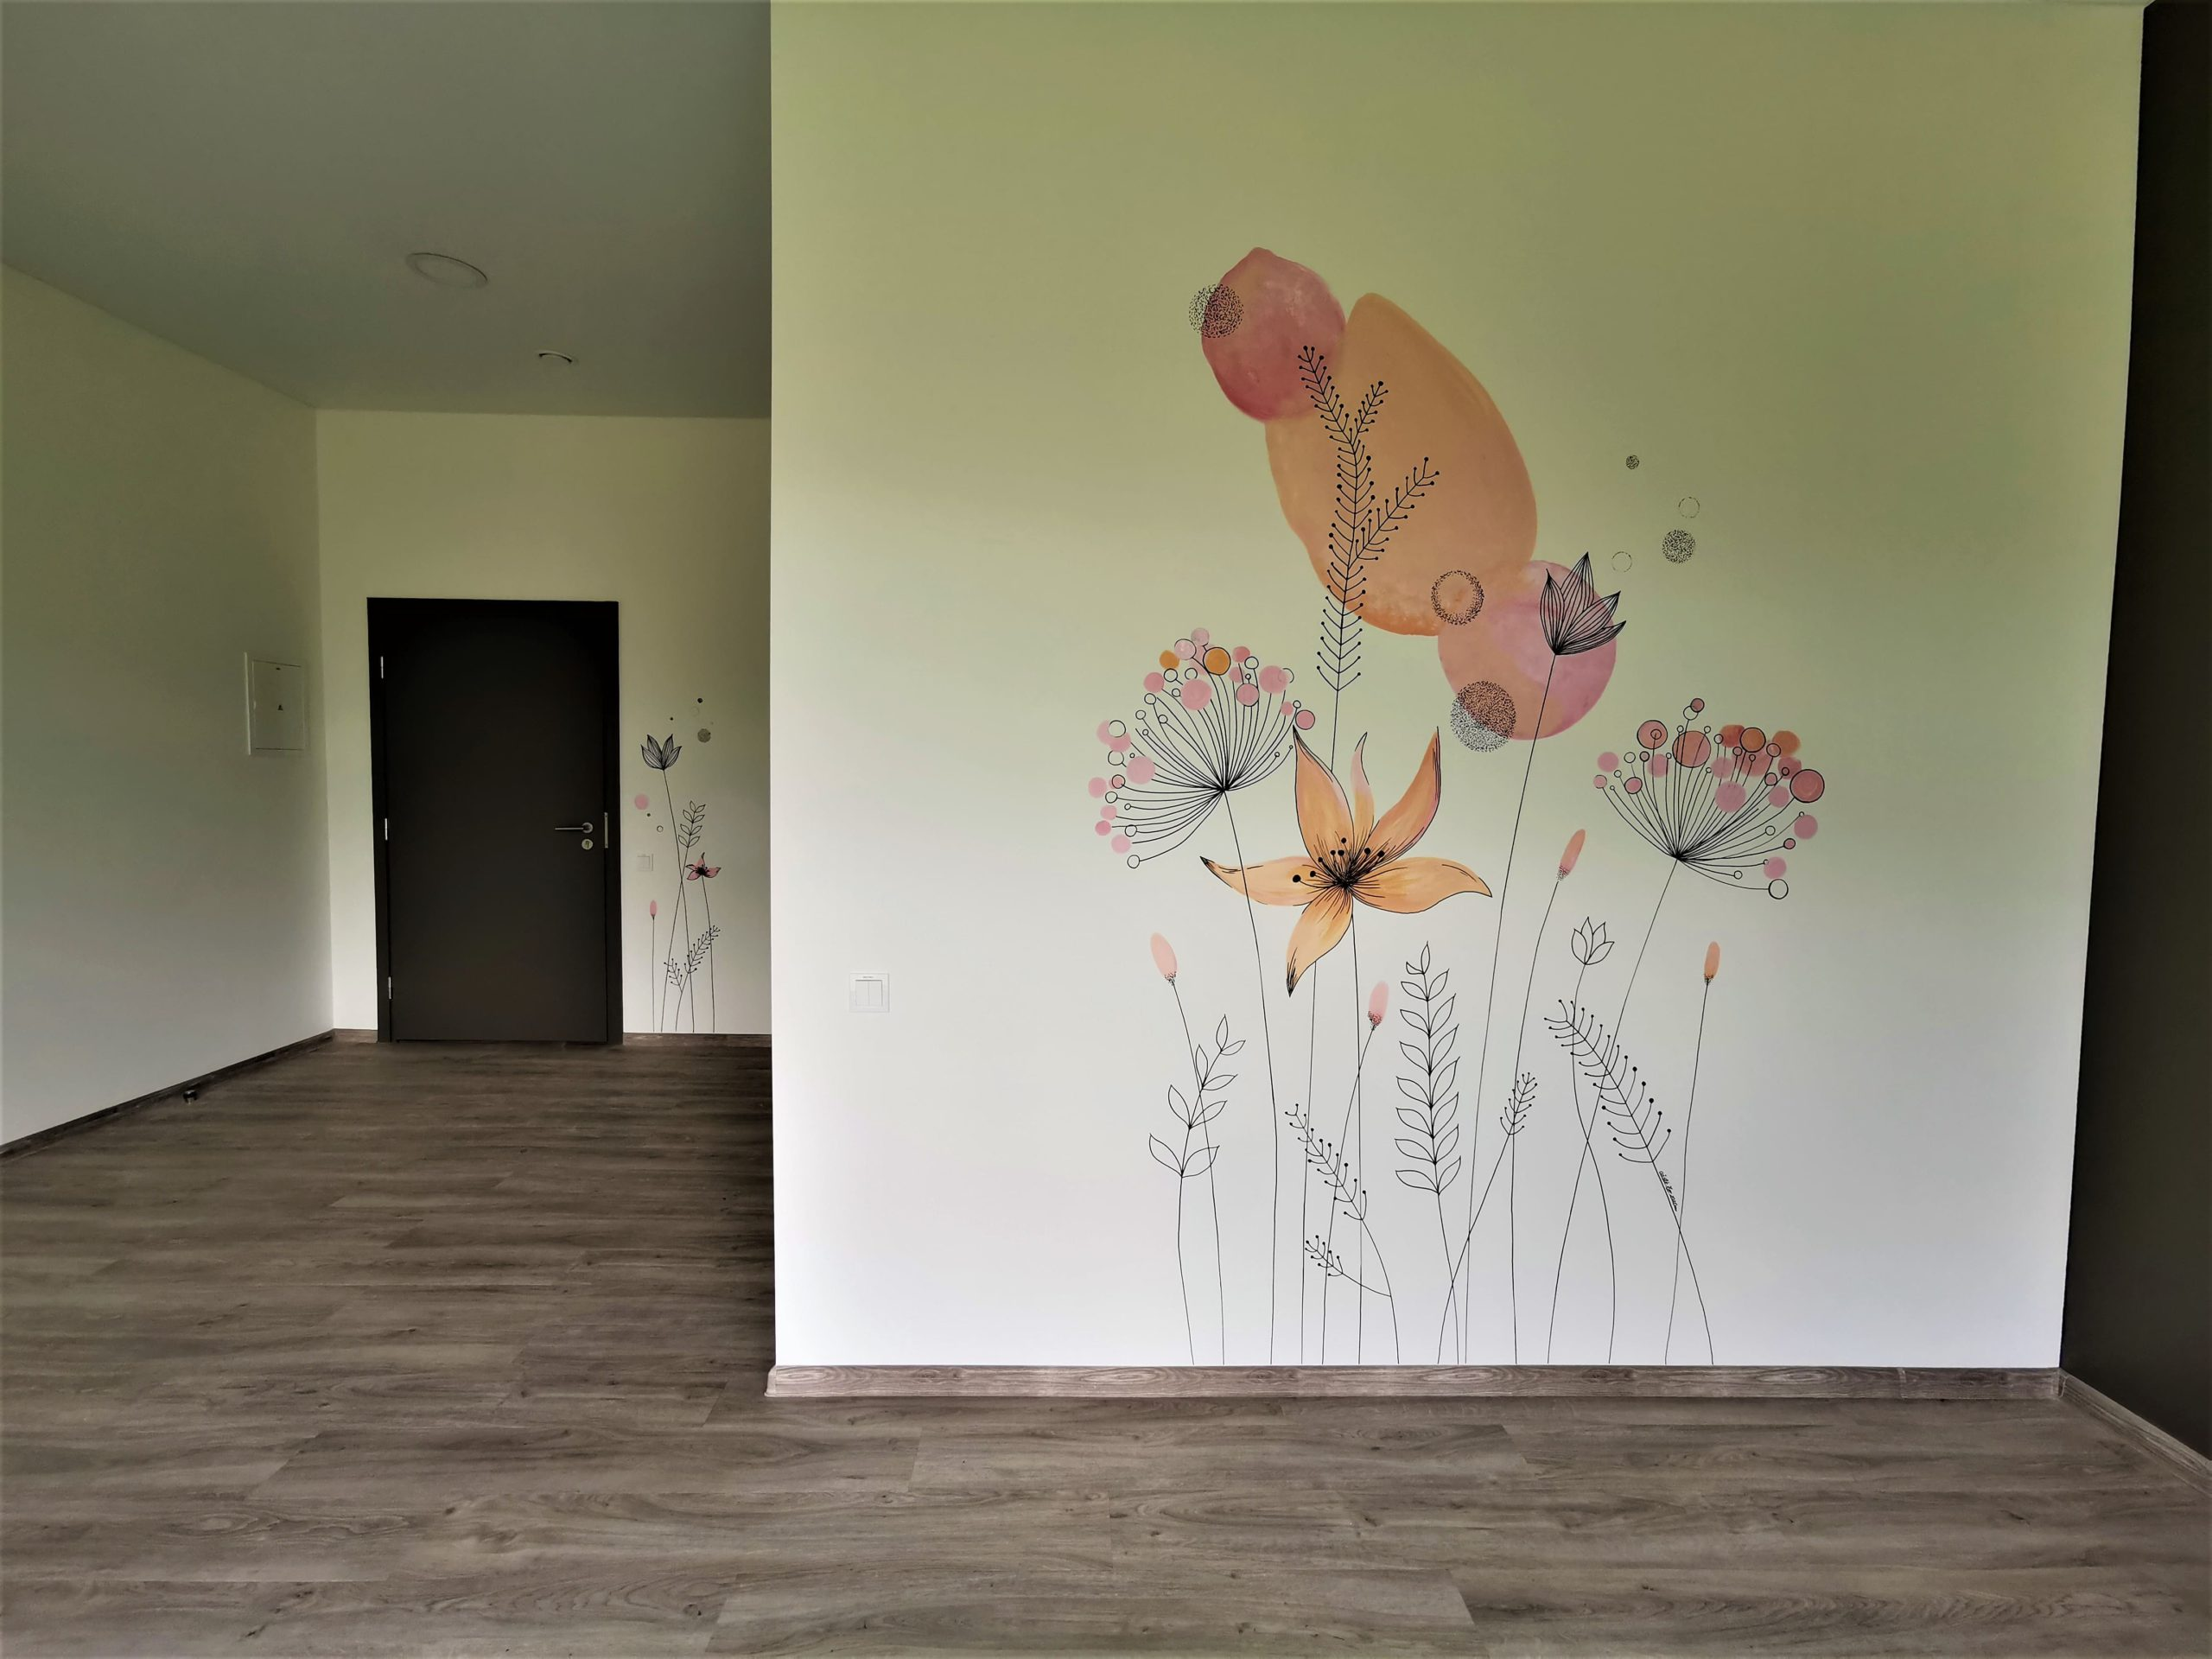 menine-kuryba-sienu-dekoravimas-ivairus-interjerai (20)